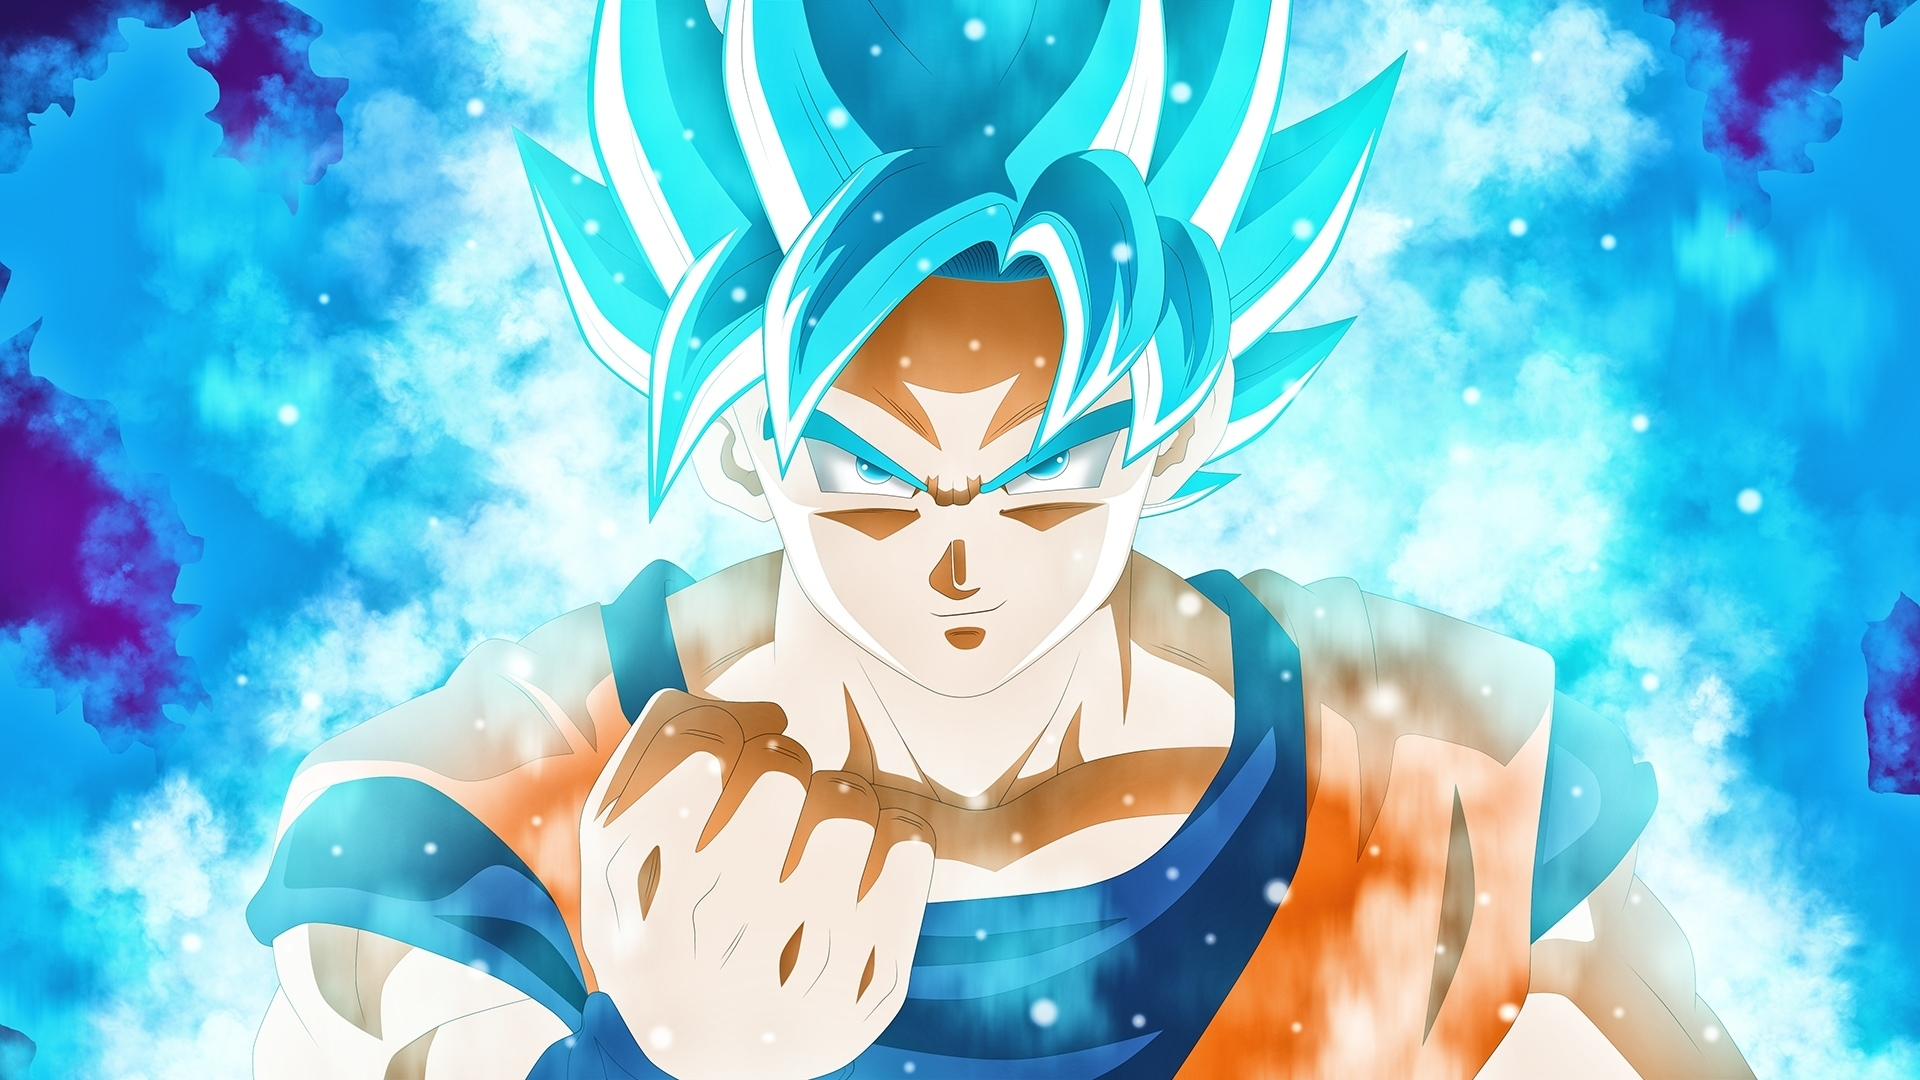 goku super saiyan blue dbs anime wallpaper #48336